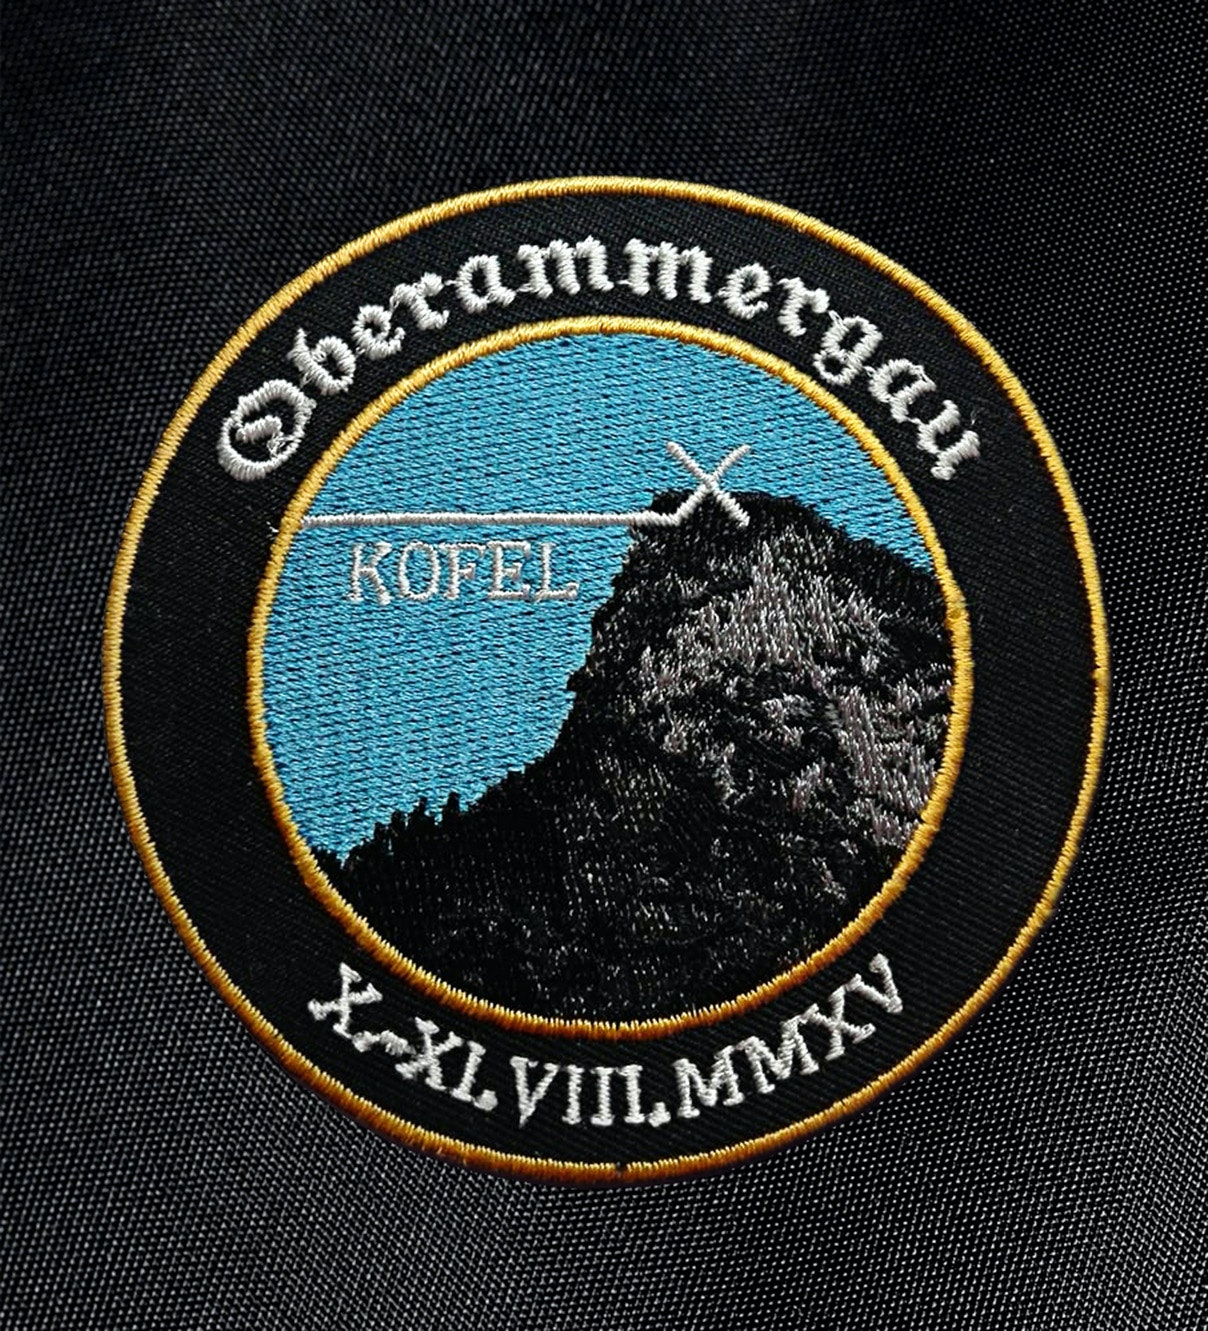 Sebastian Wanke, Diplom, Kofel, Weimar, Oberammergau